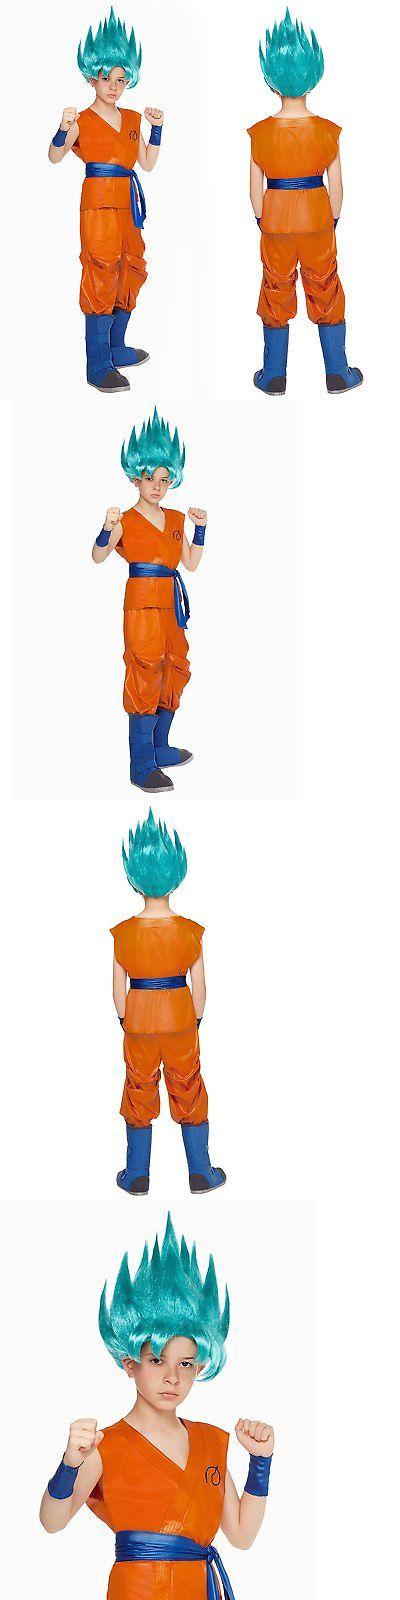 Unisex 86207 Kids Halloween Goku Costume Dragon Ball Z Resurrection F Trick Or Treat Party  sc 1 st  Pinterest & Unisex 86207: Kids Halloween Goku Costume Dragon Ball Z Resurrection ...